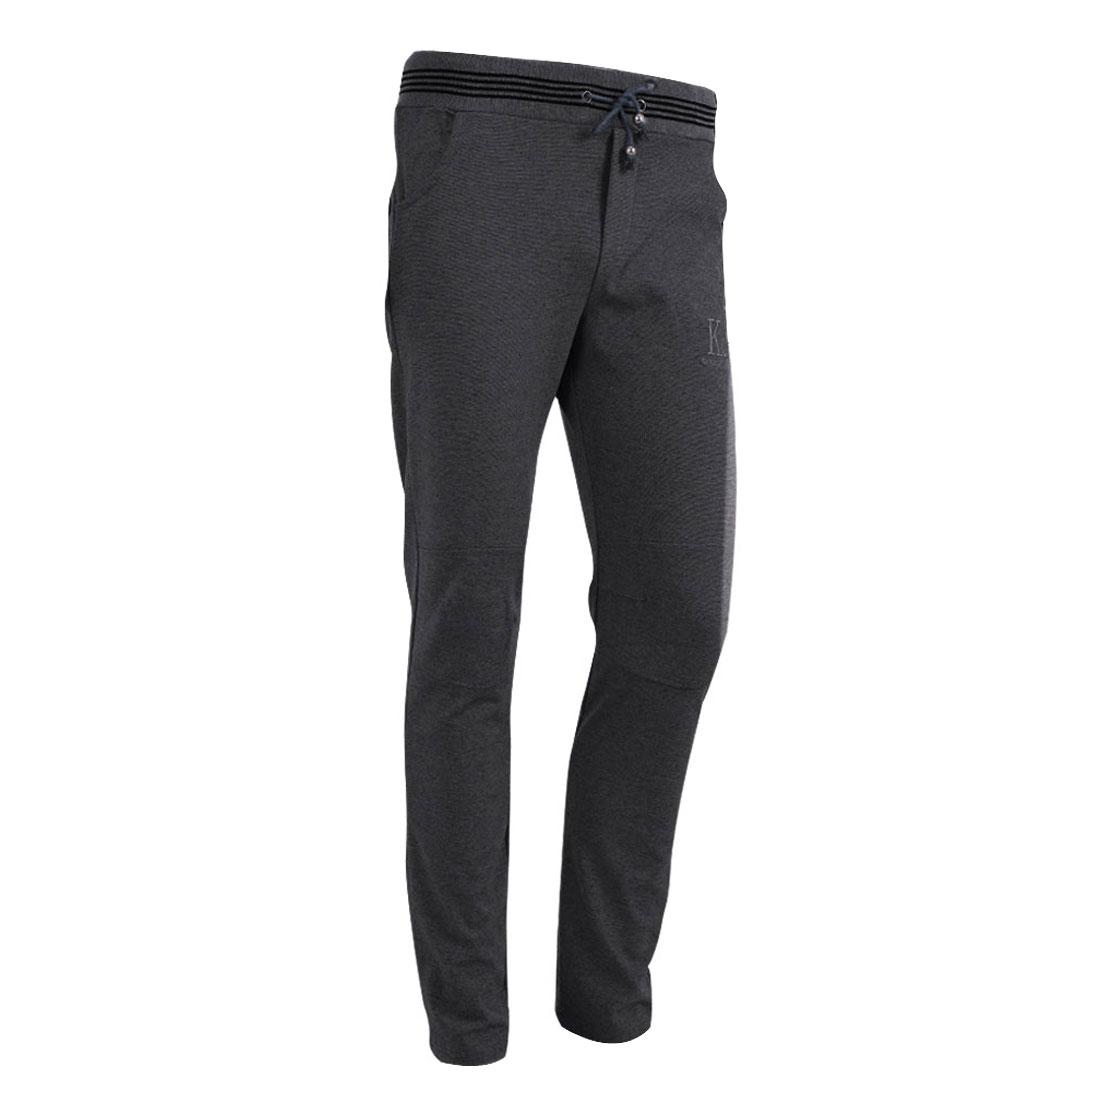 Man Drawstring Hip Pocket Modern Long Leisure Trousers Dark Gray W29